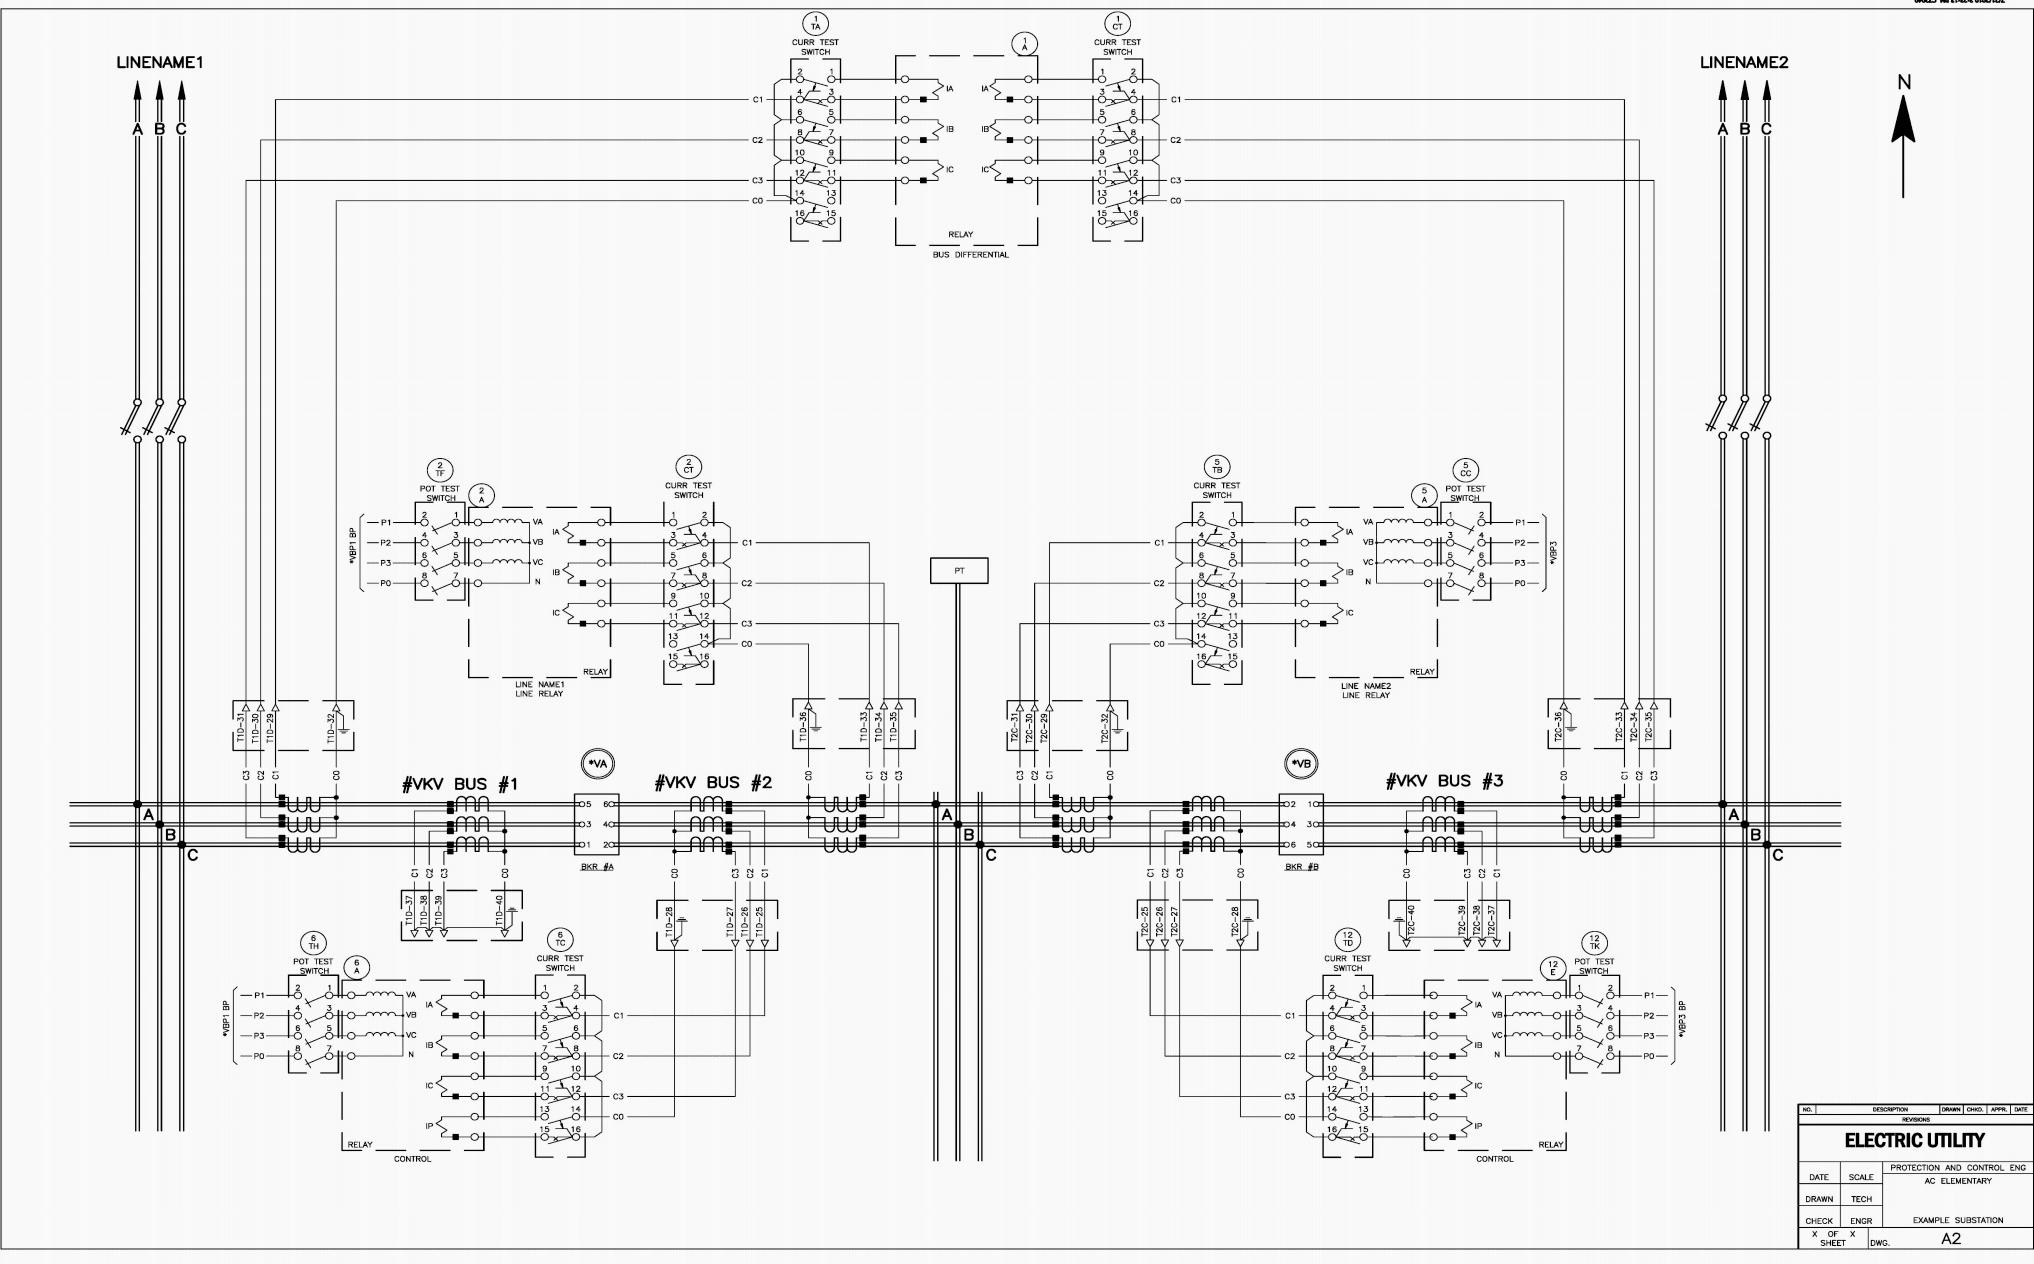 New How To Read Schematics Diagram Diagram Wiringdiagram